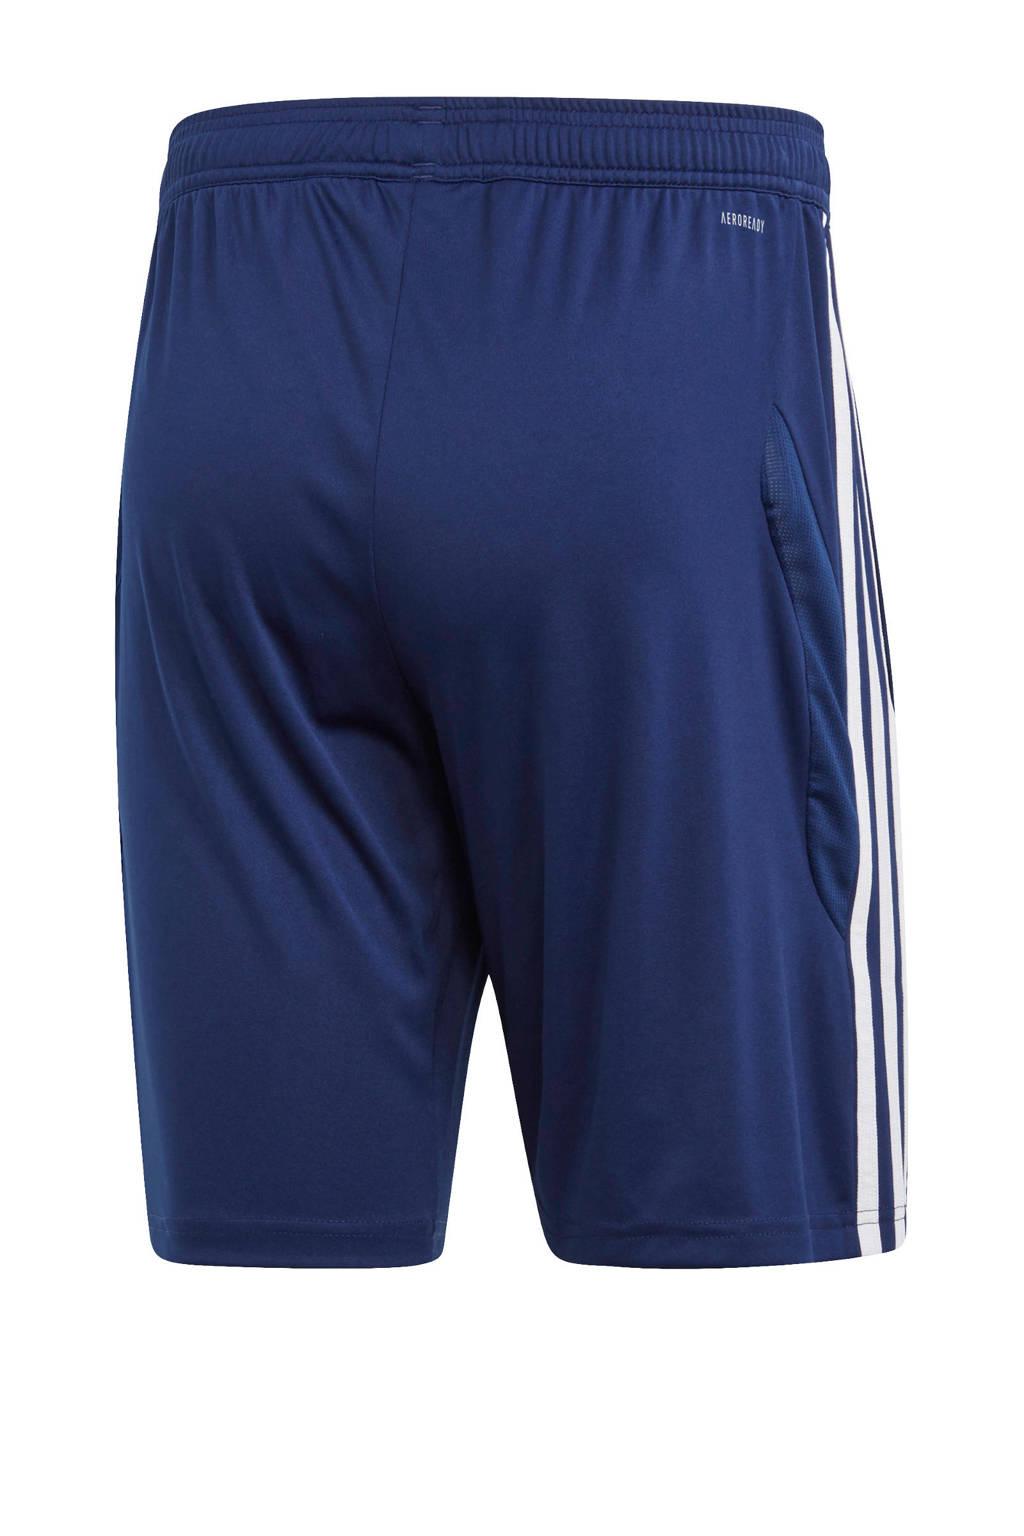 adidas Performance   sportshort Tiro 19 donkerblauw, Donkerblauw/wit